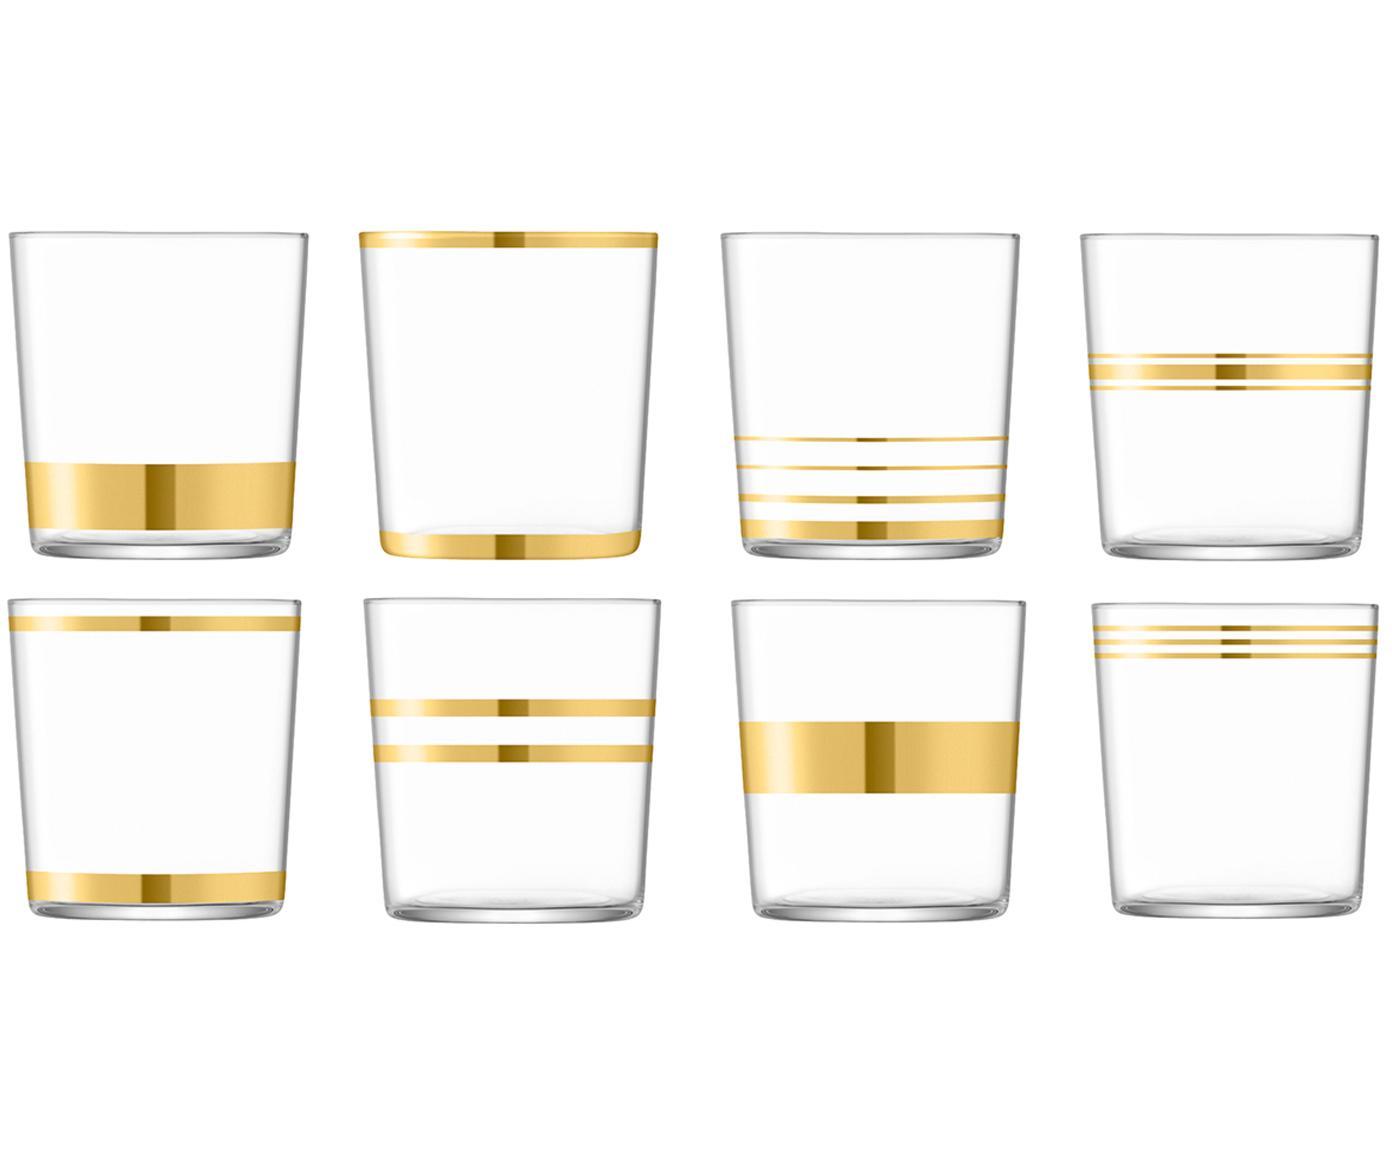 Waterglazenset Deco, 8-delig, Glas, Transparant, goudkleurig, Ø 8 x H 9 cm